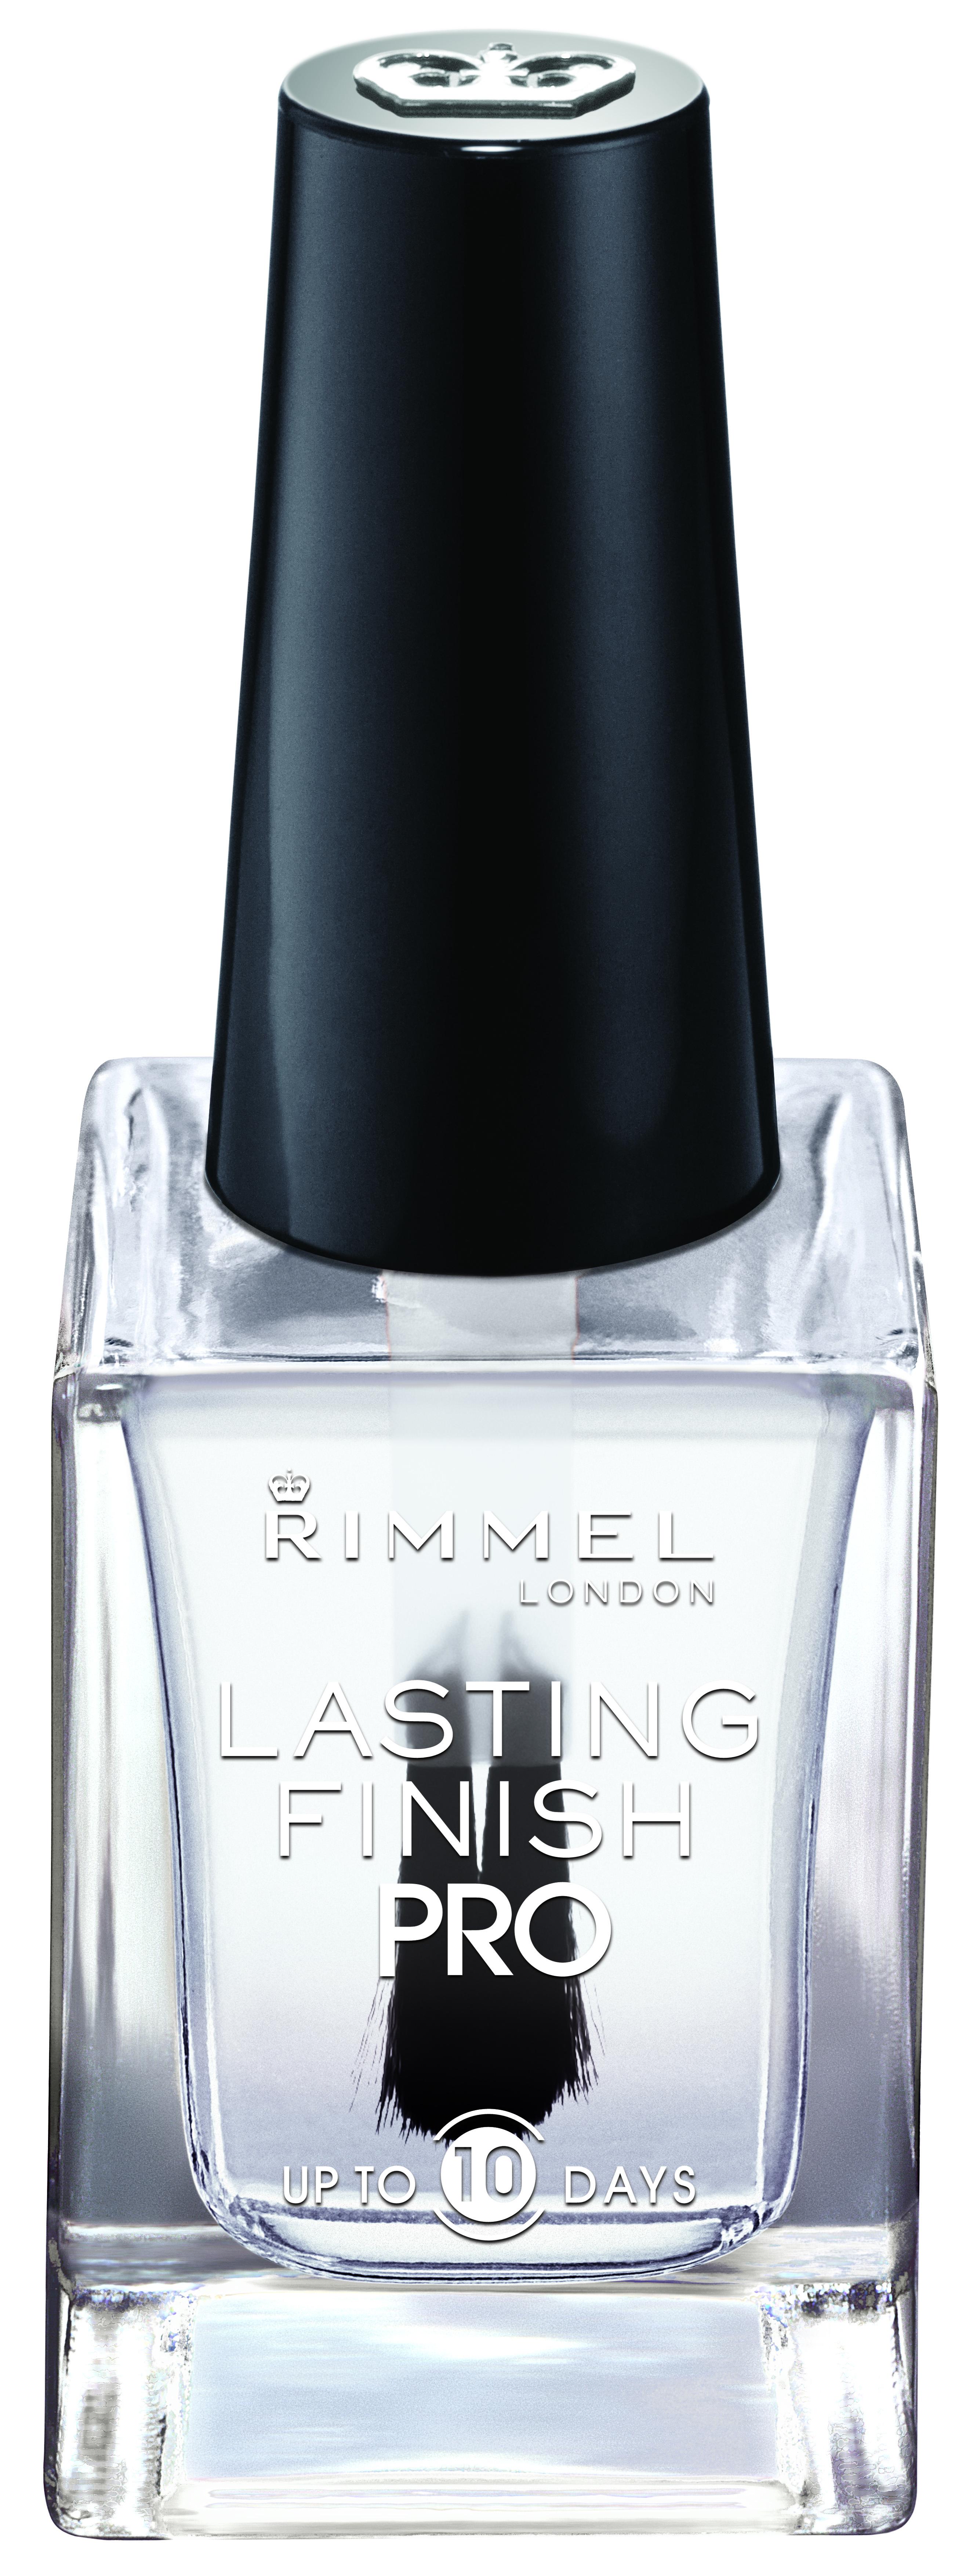 Rimmel London Lasting Finish Pro Nail Enamel, Crystal Clear